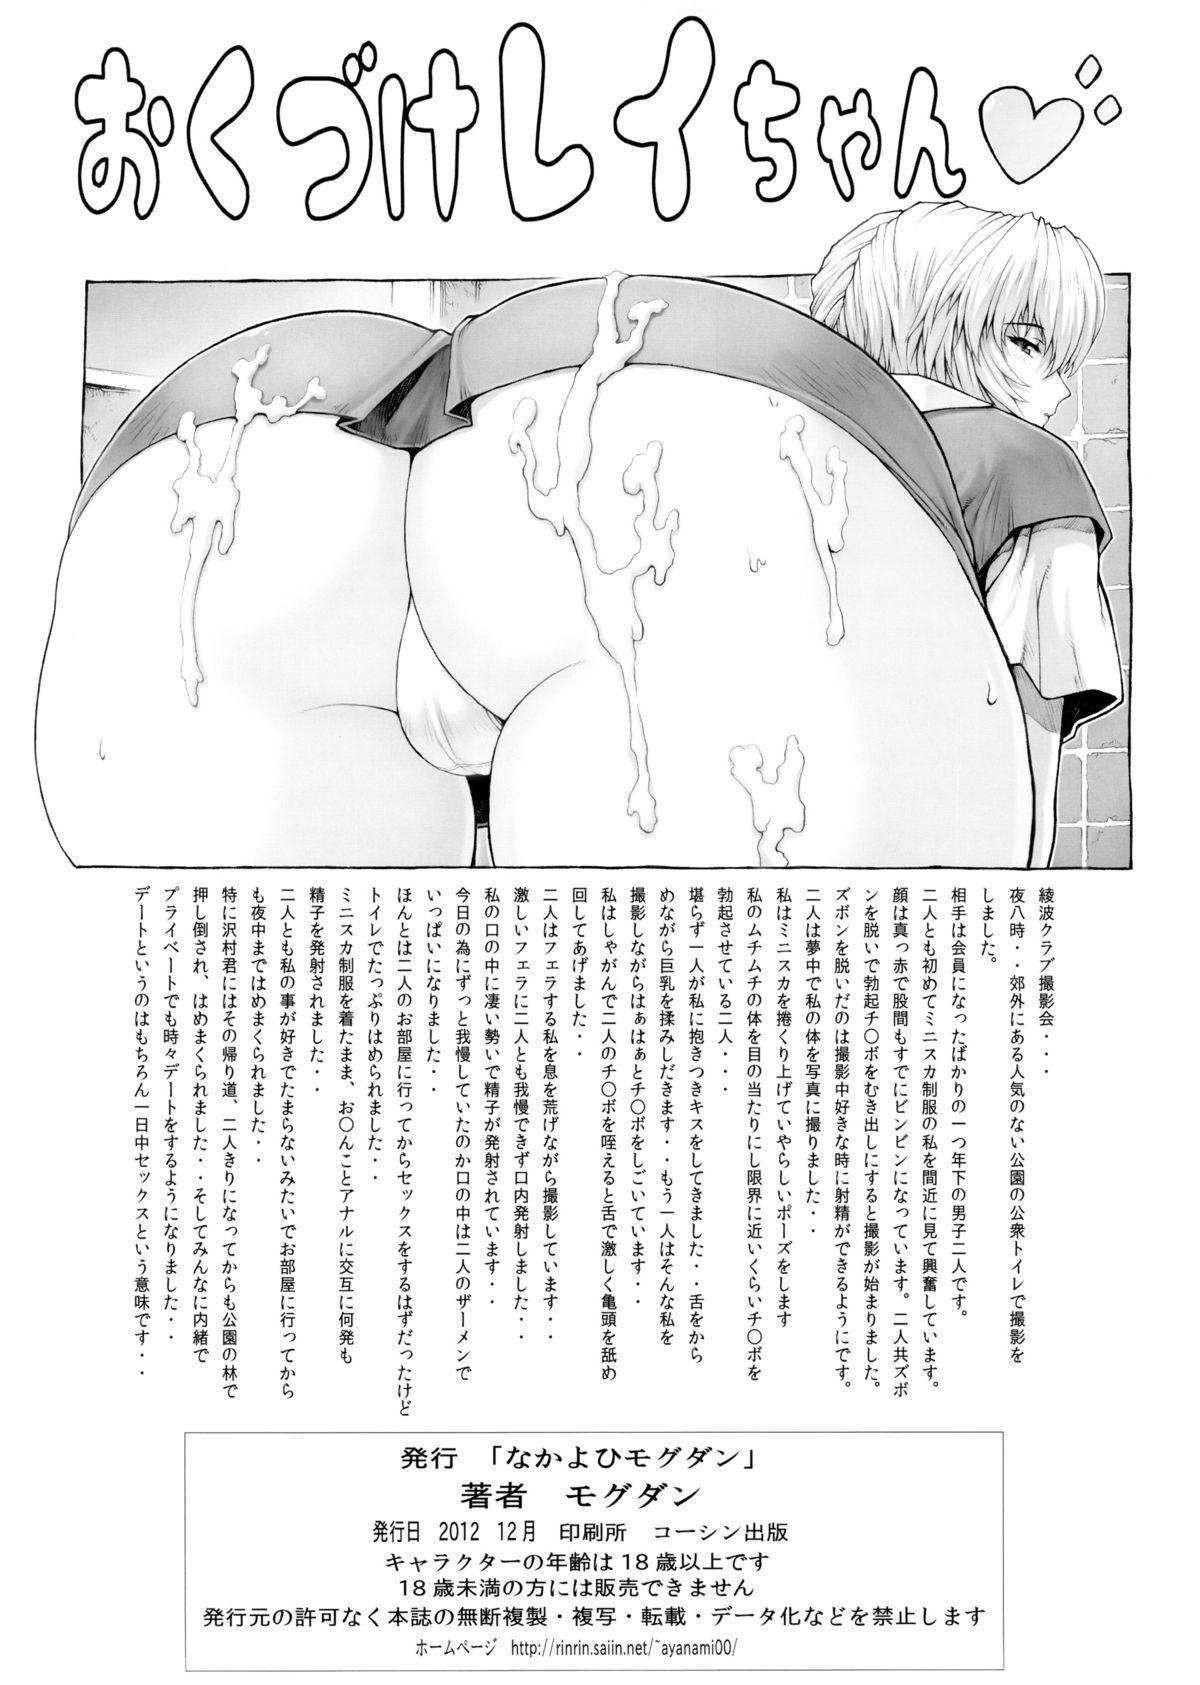 Ayanami Dai 4 Kai + Omake Bon + Postcard 38